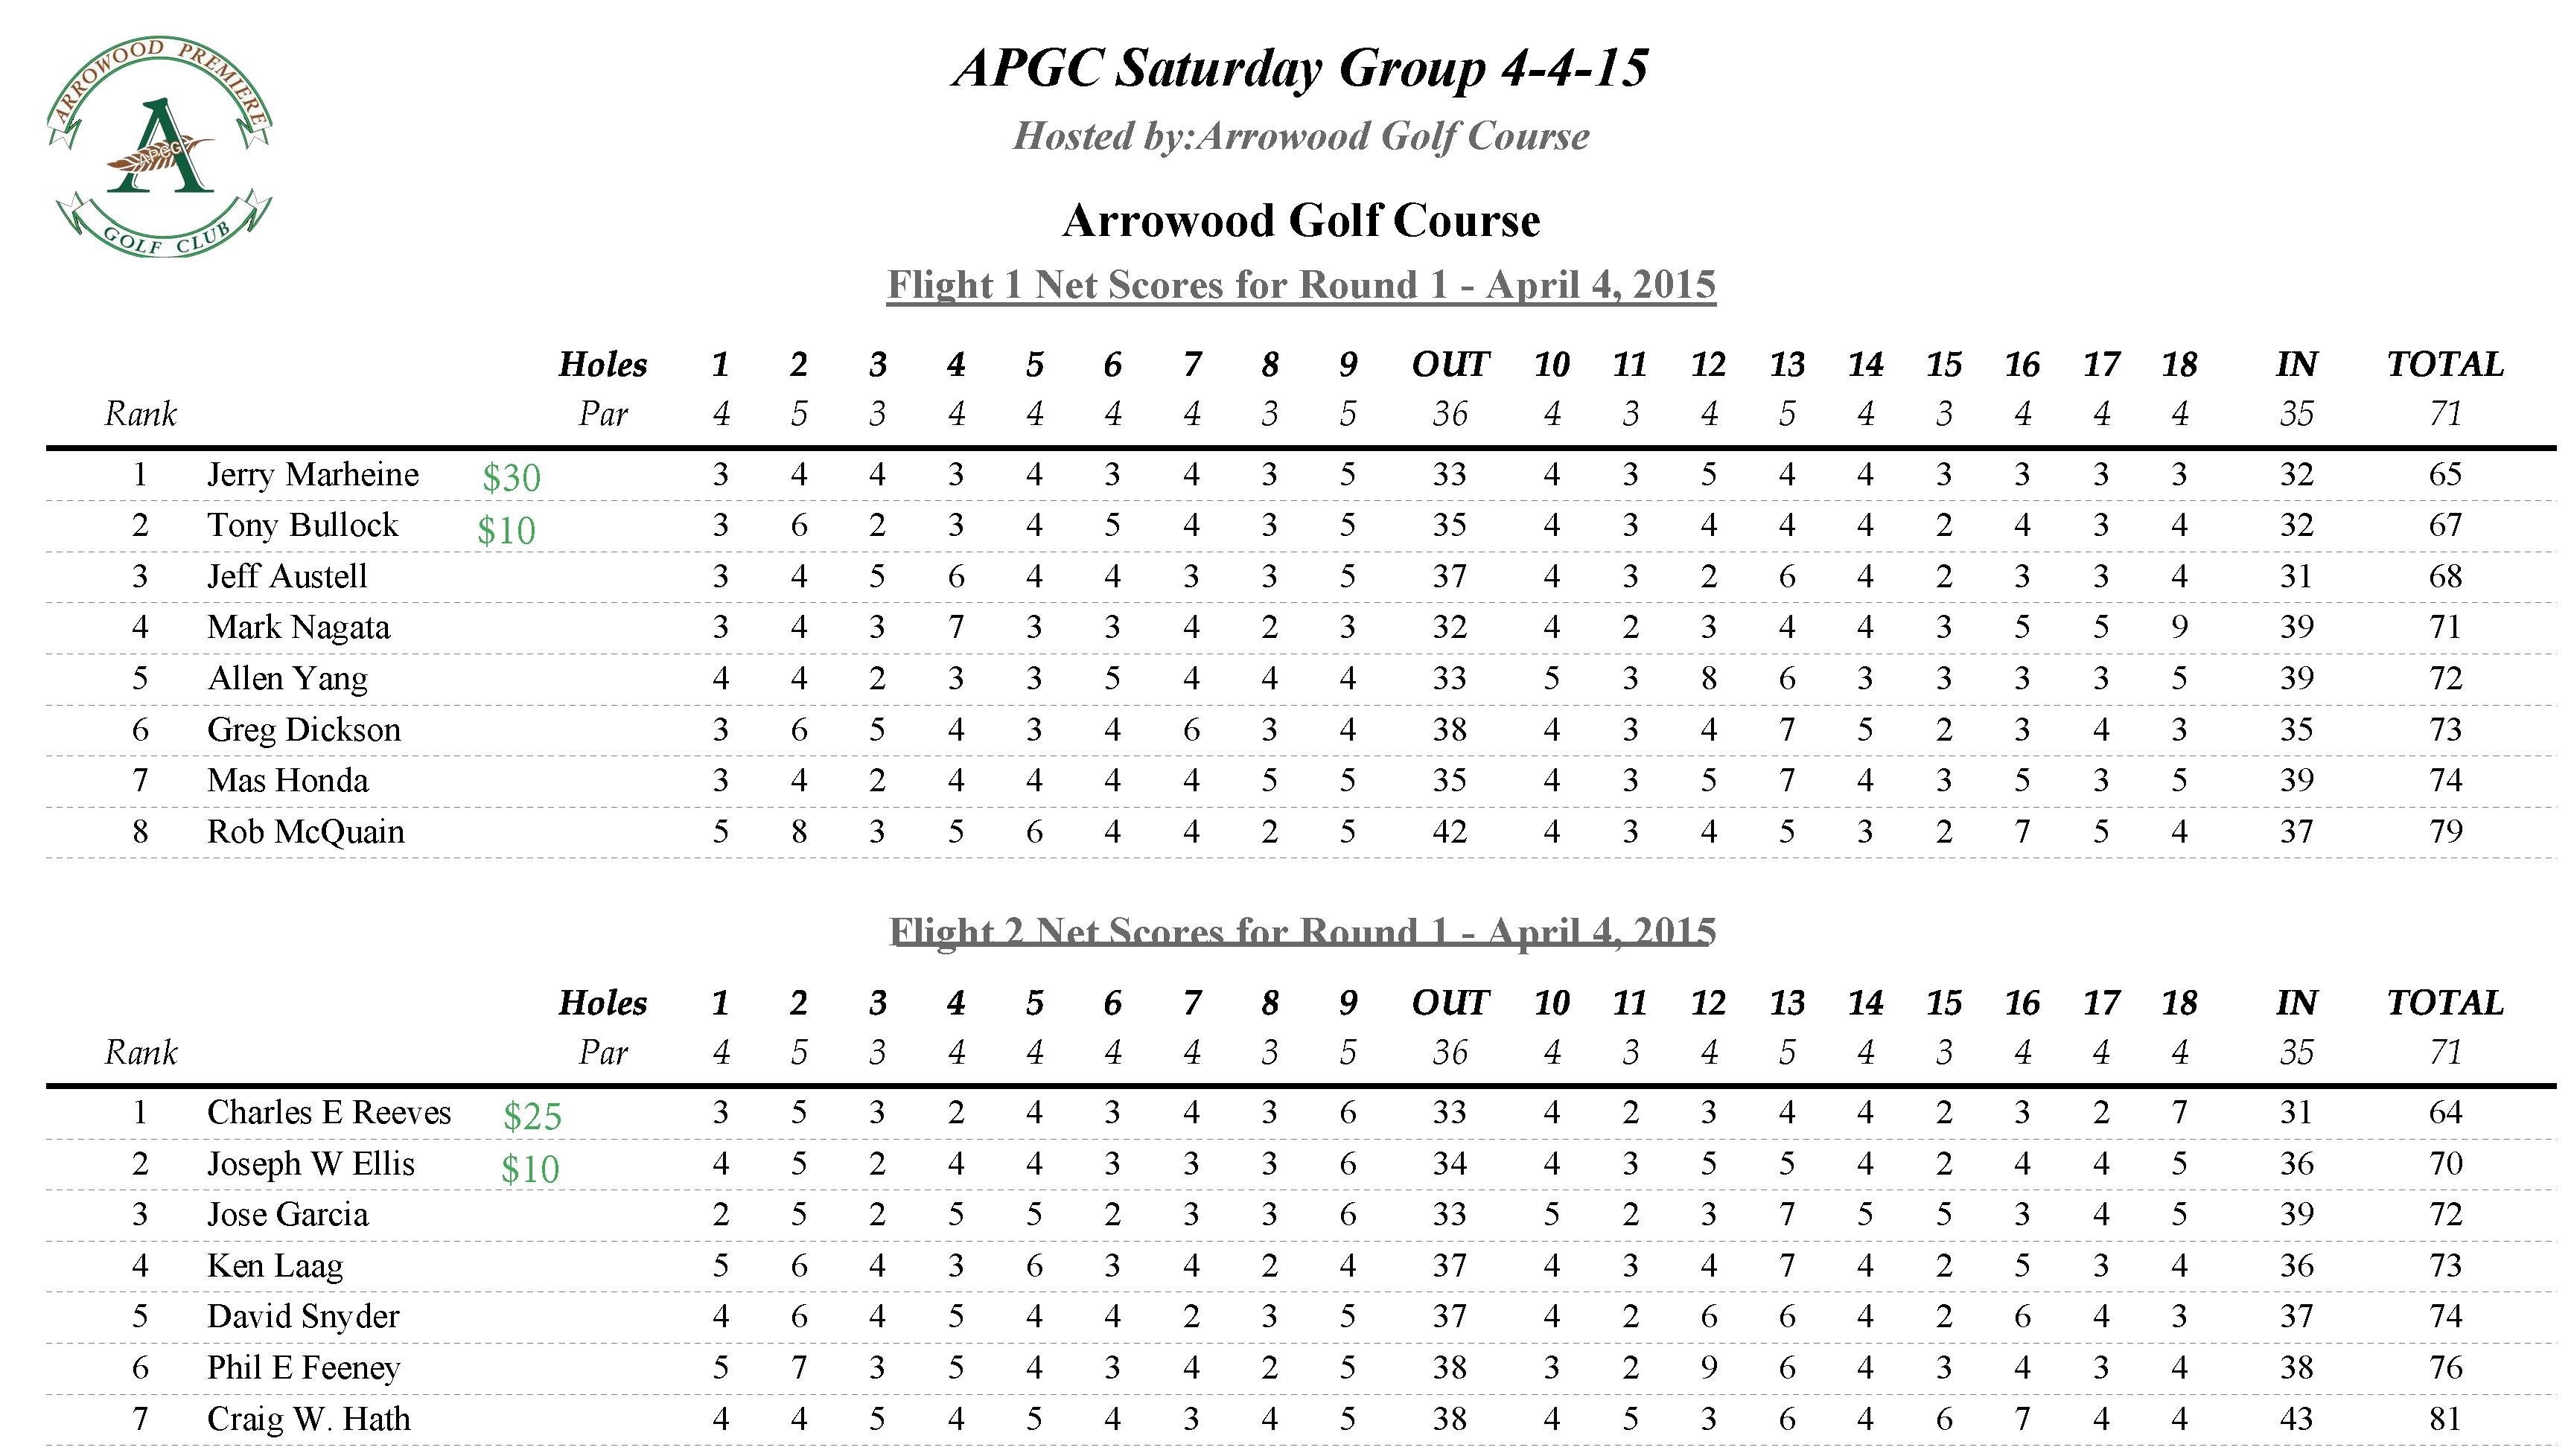 APGC Saturday 4-4-15